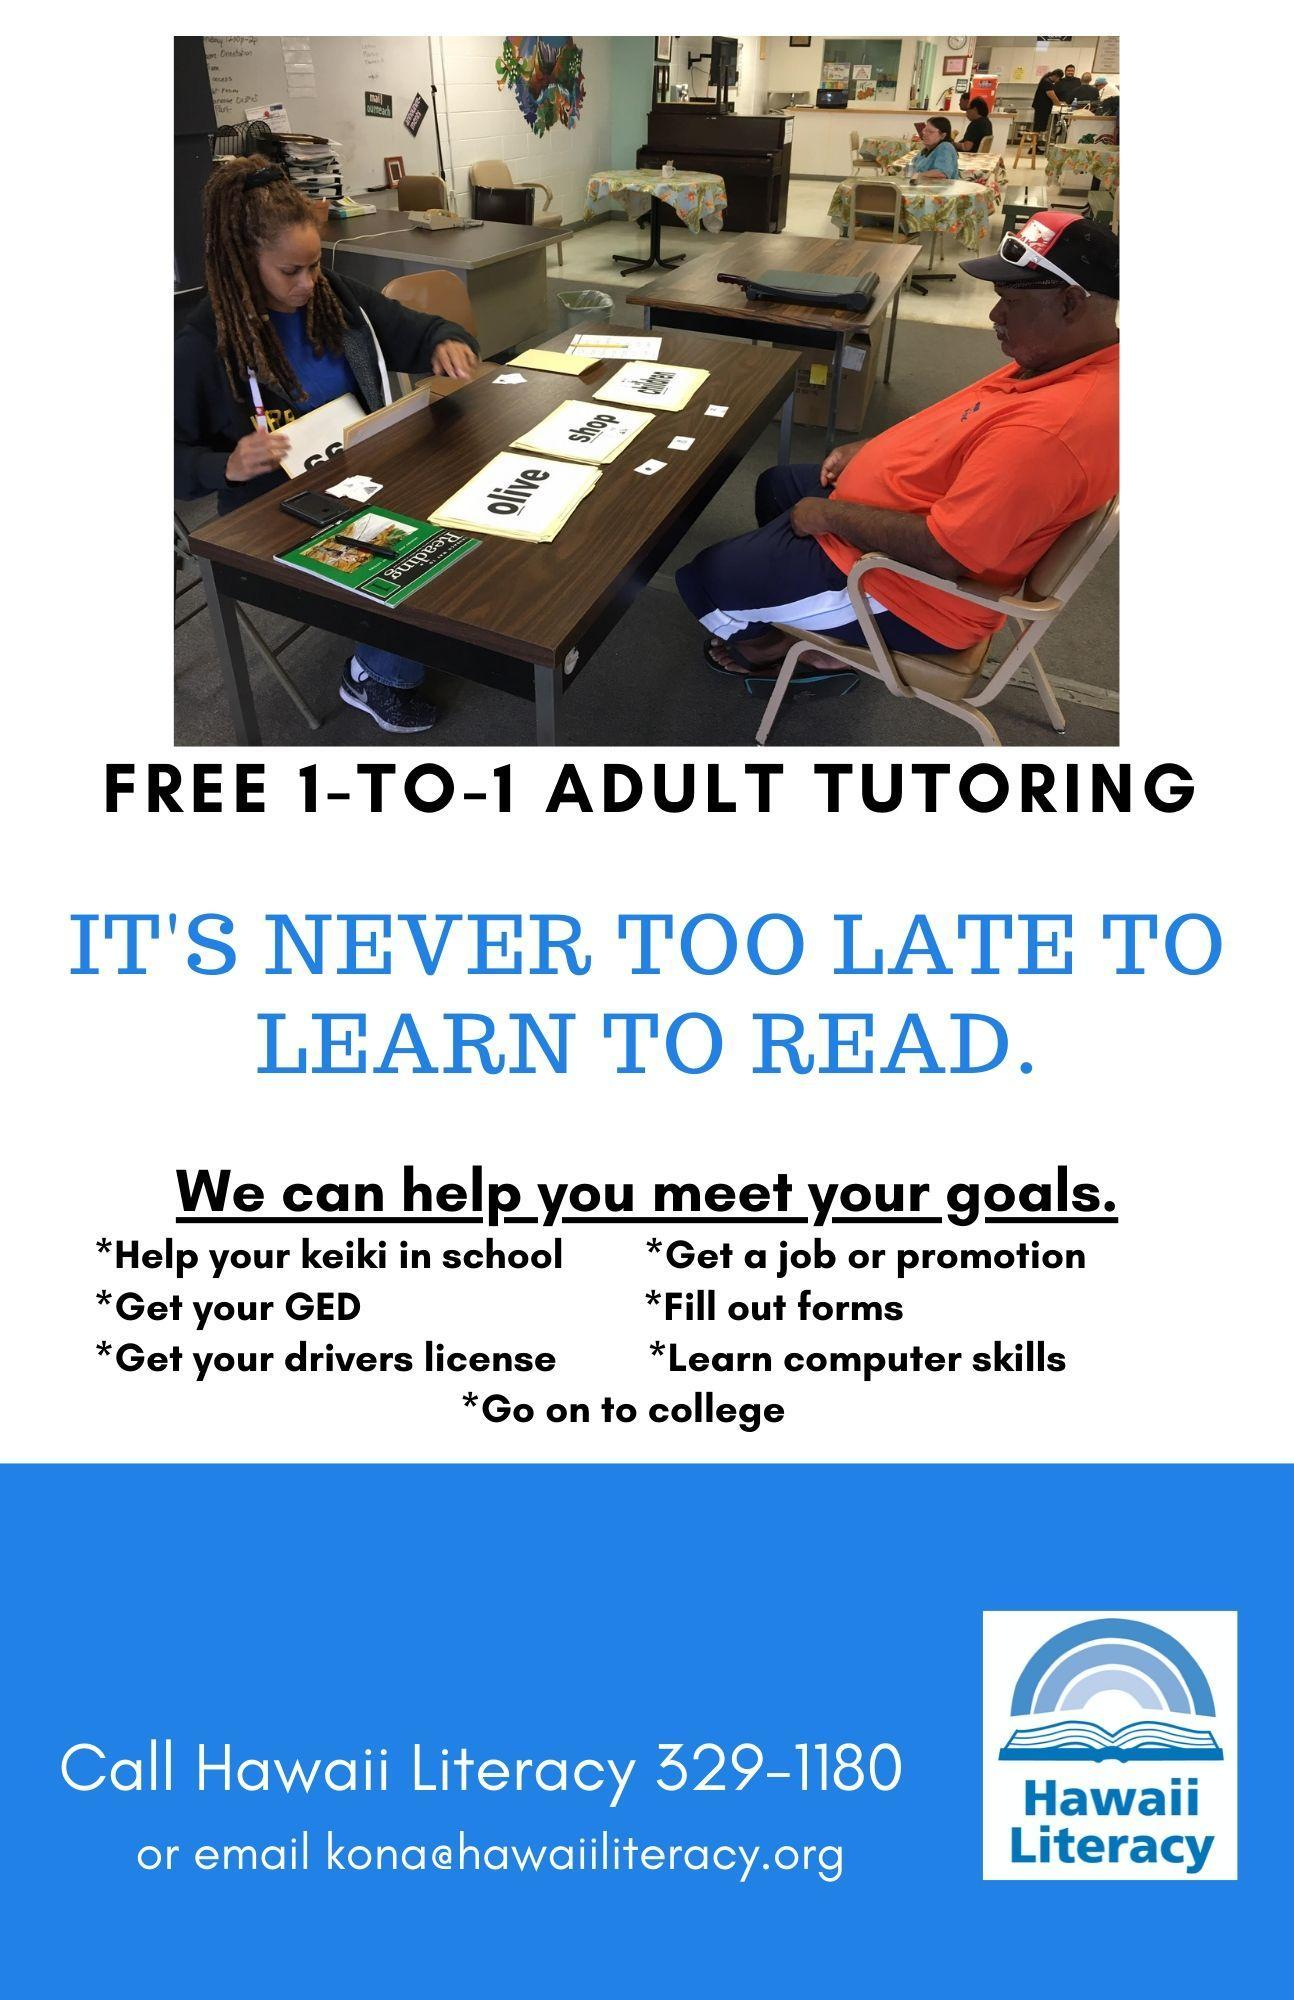 Flyer for Kona Adult English Tutoring